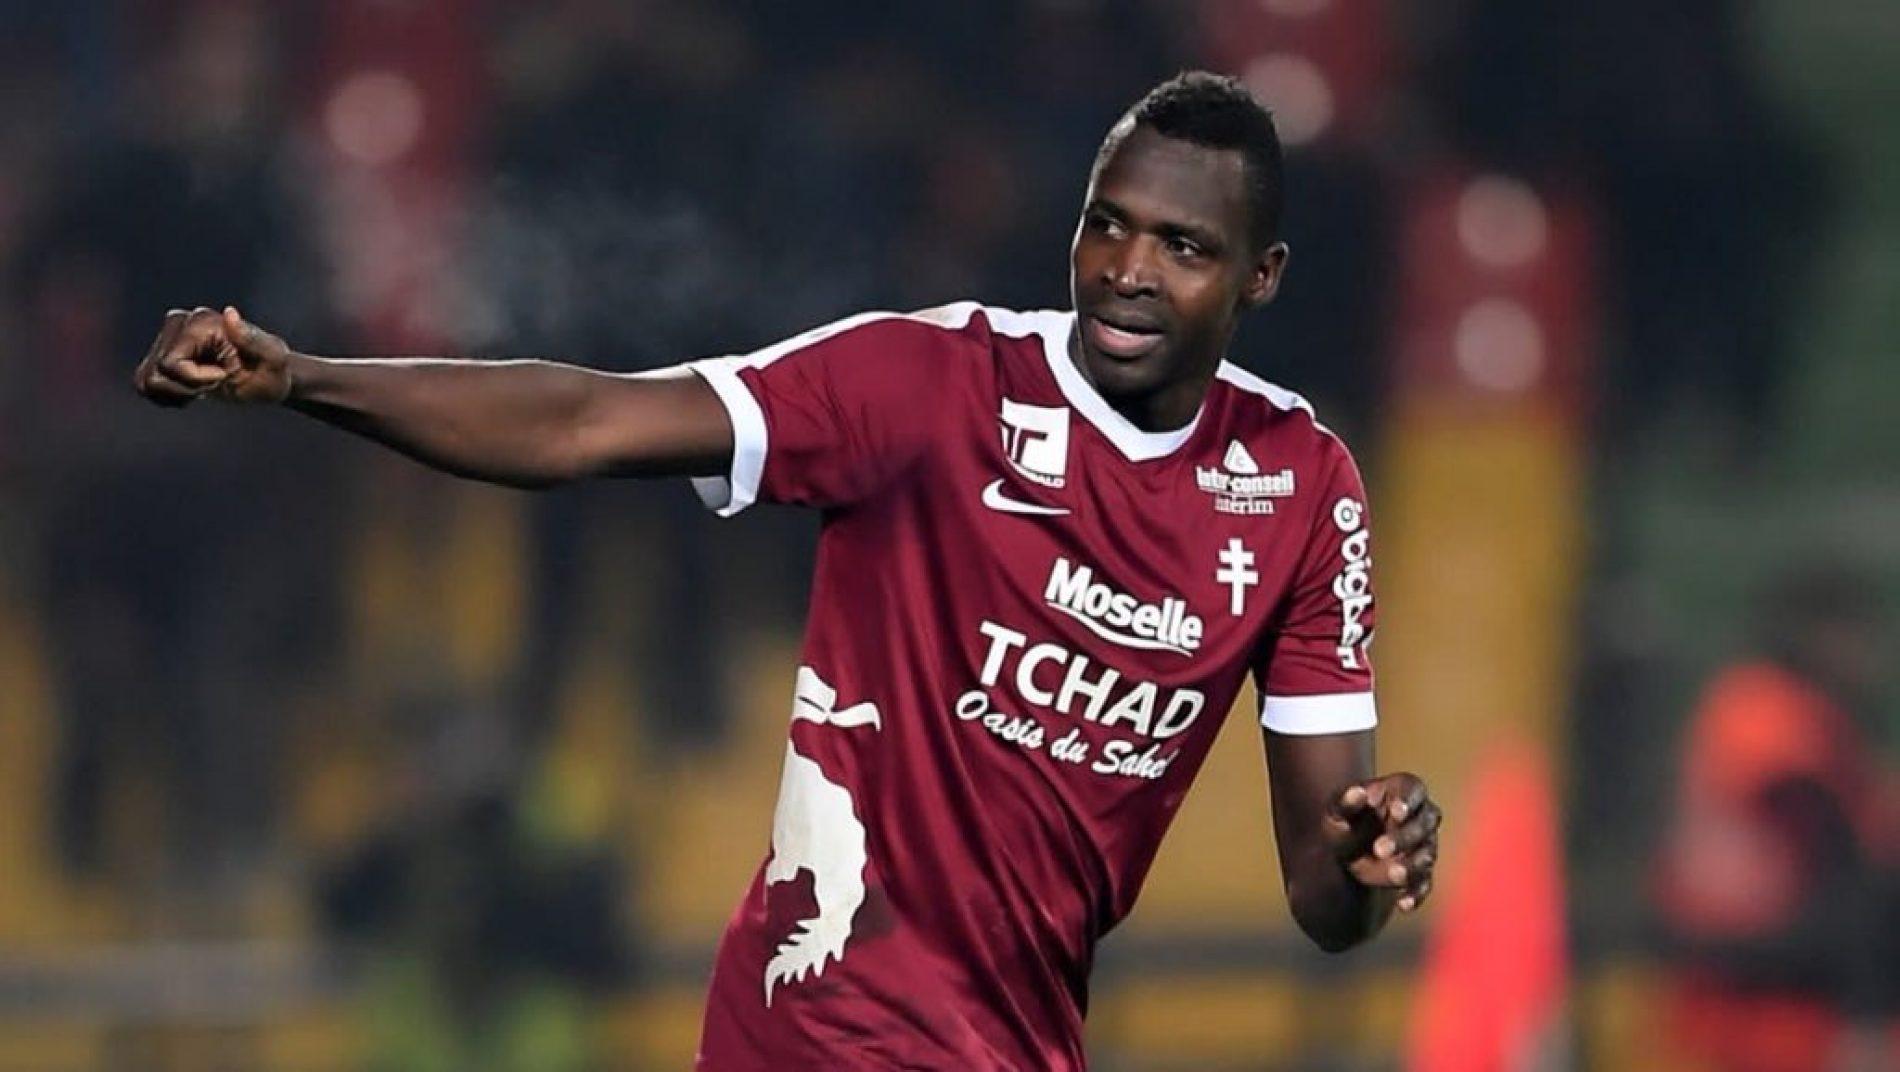 Ufficiale: Benevento, arriva la firma di Diabaté